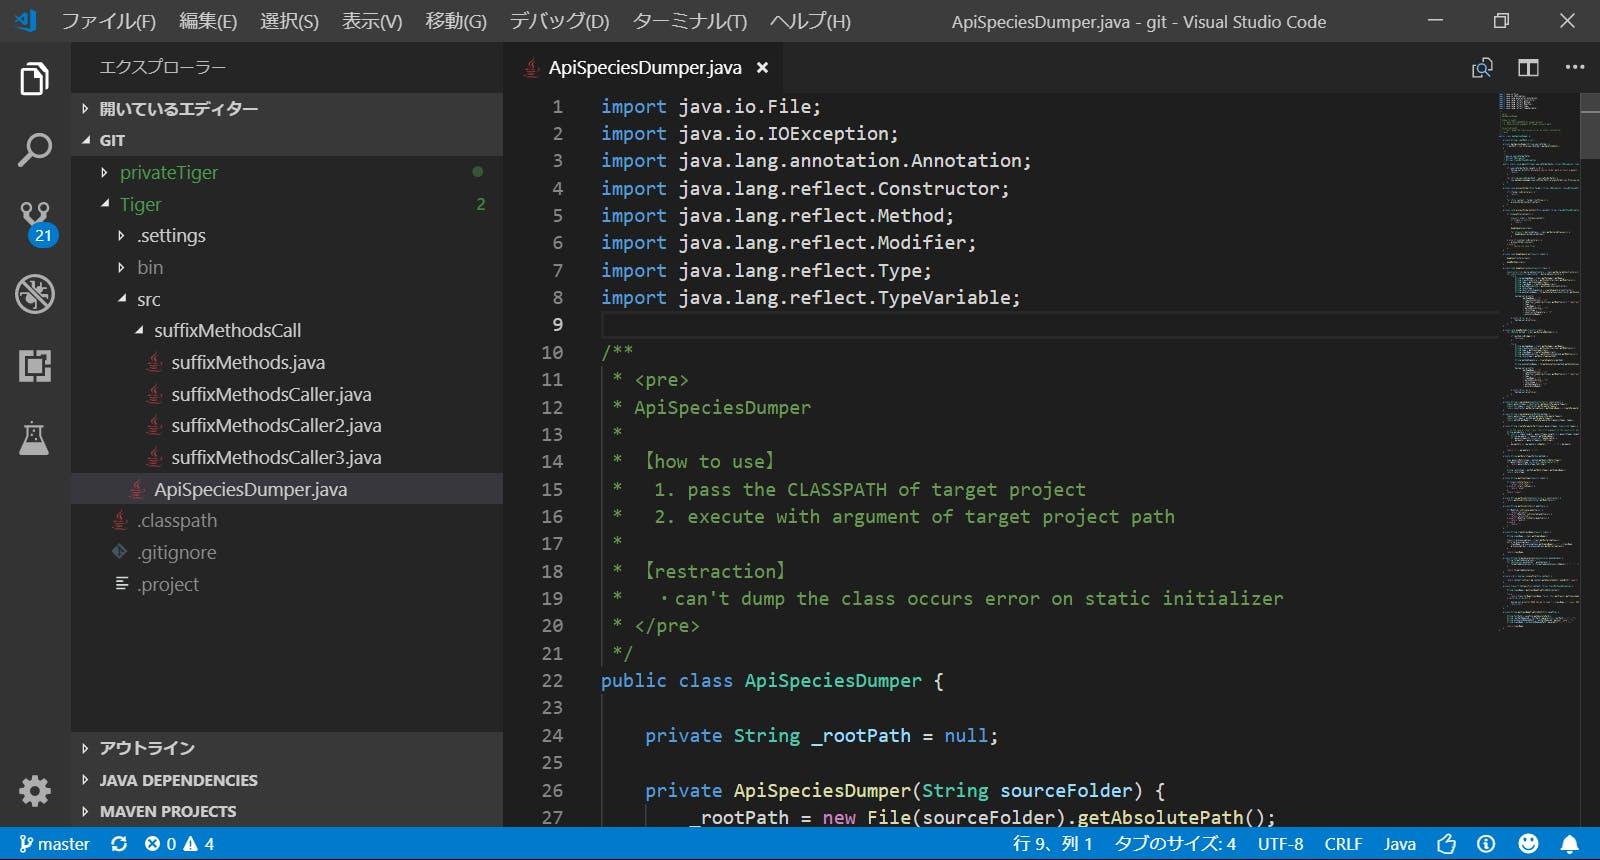 SnapCrab_ApiSpeciesDumperjava - git - Visual Studio Code_2019-1-19_23-22-32_No-00.png